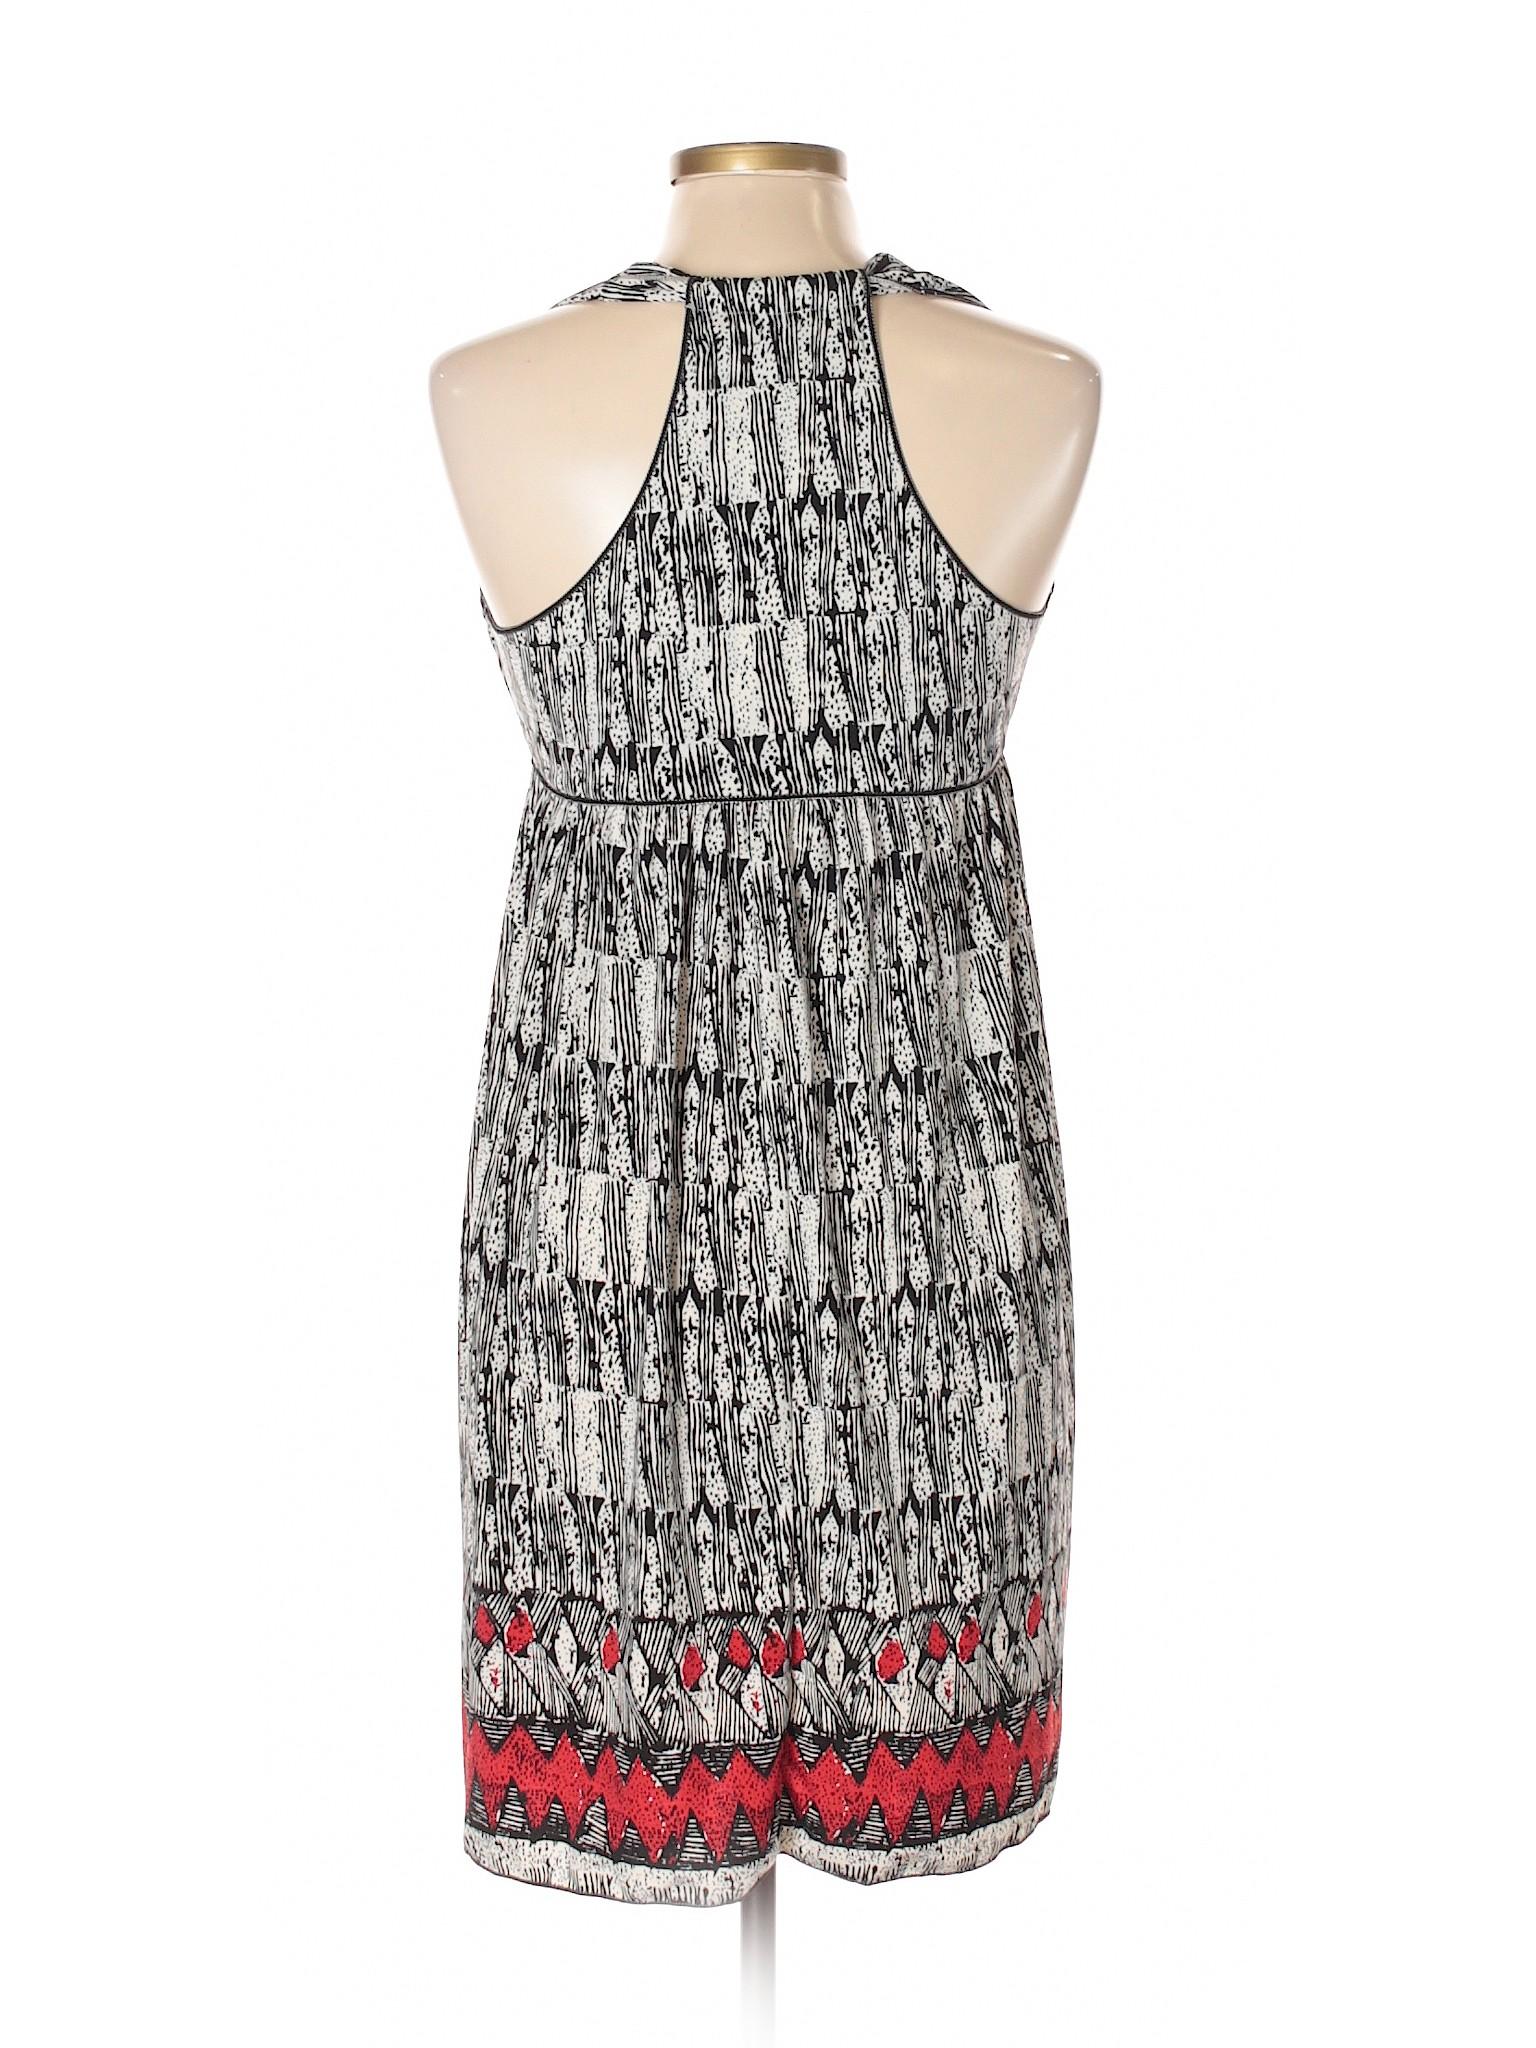 Casual Dress Selling Selling Studio Max Max 1xgIPgf